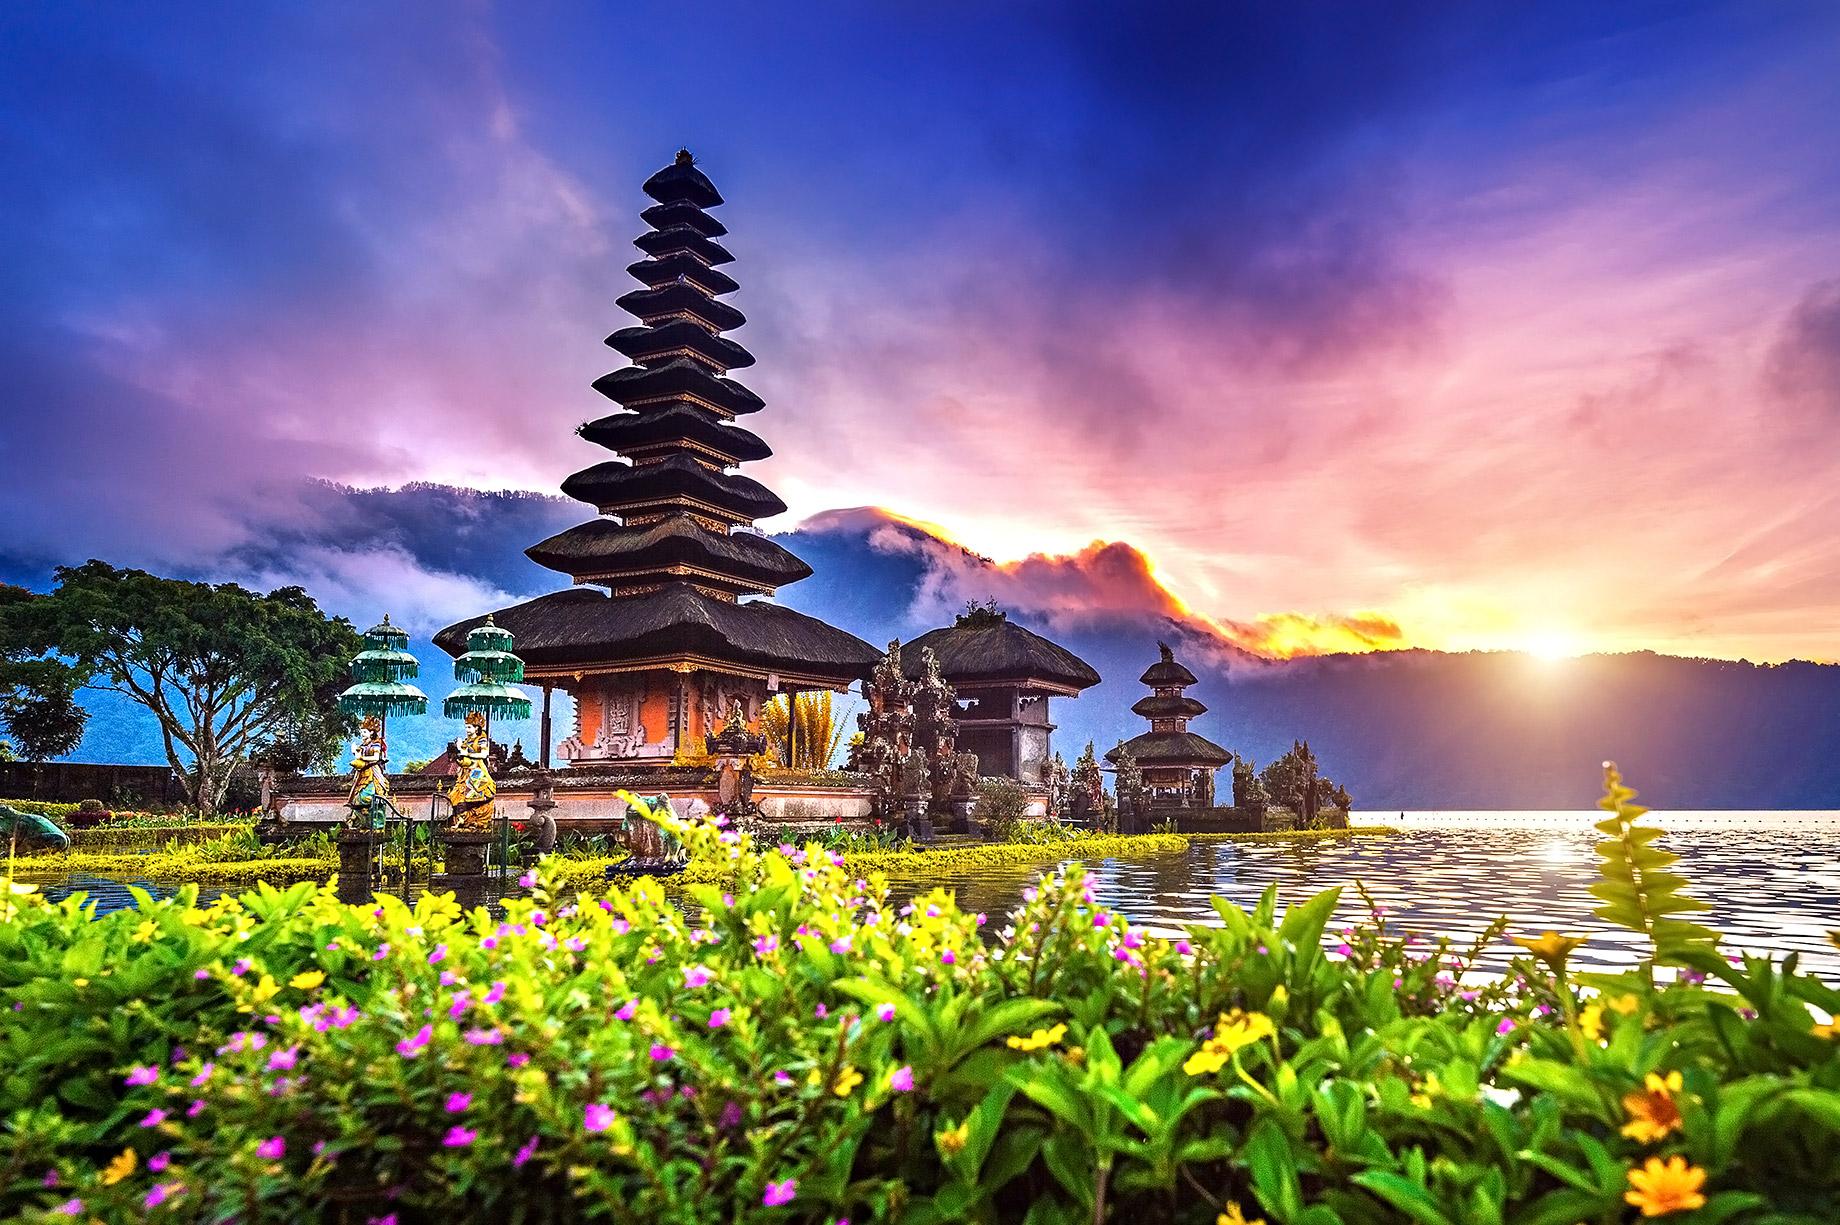 Pura Ulun Danu Bratan Temple - Bali, Indonesia - Top 10 Luxury Travel Destinations Around the World